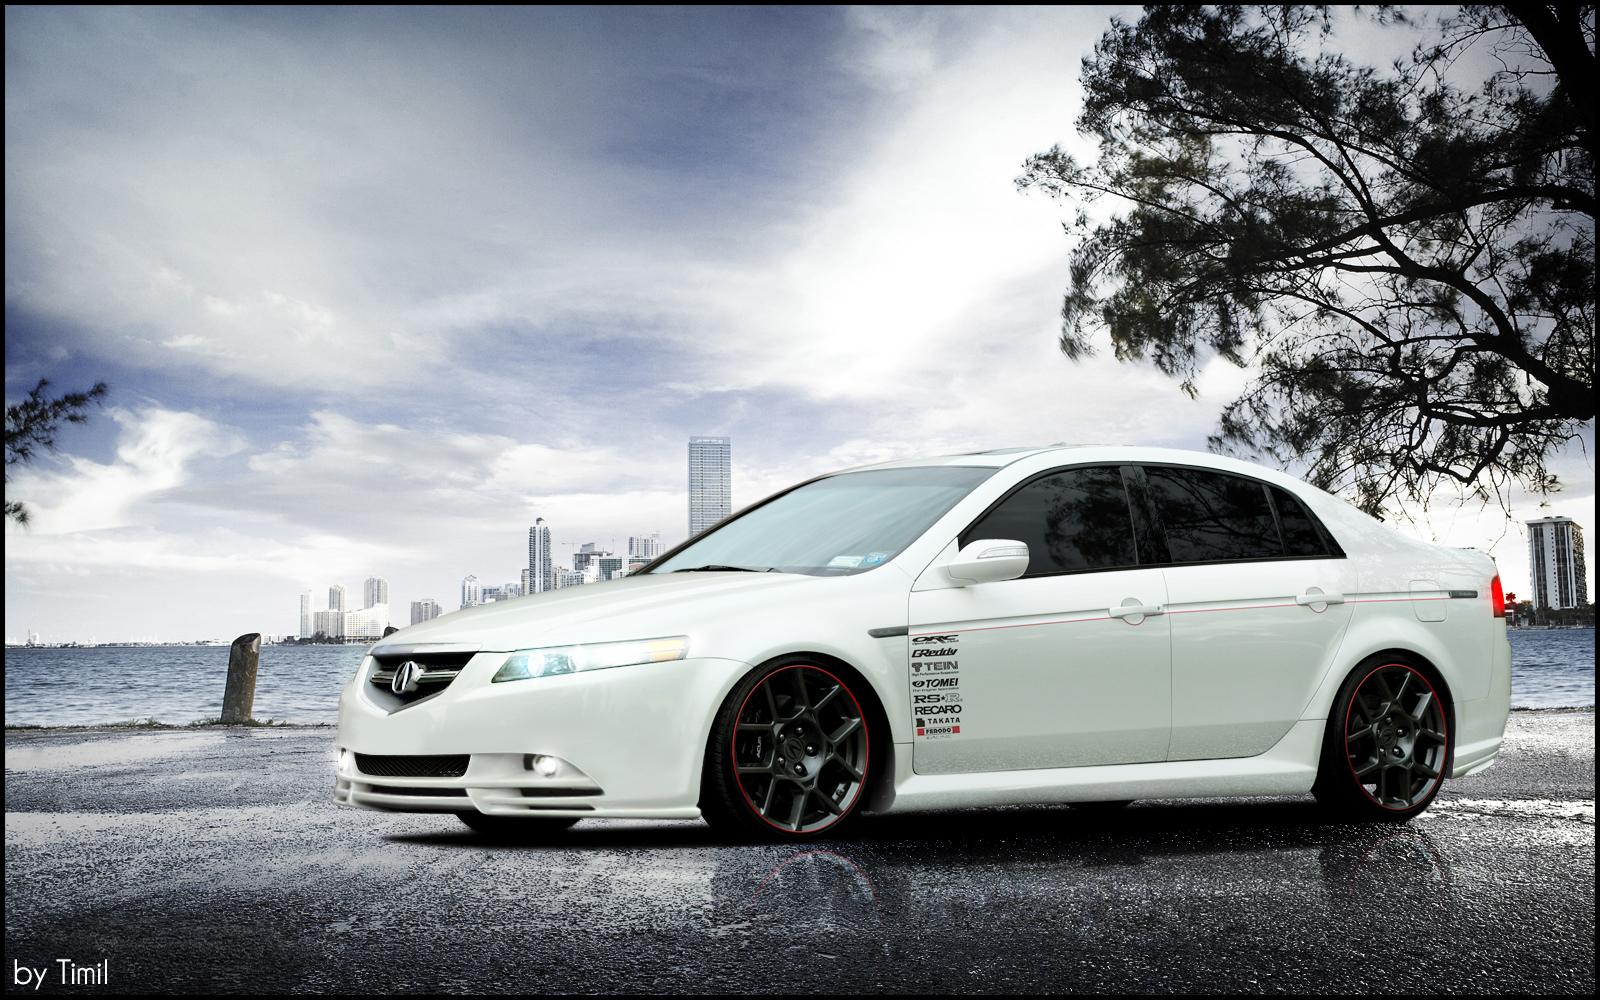 Car Drifting Wallpaper Hd 1080p 2013 Acura Wide Wallpaper Free Download